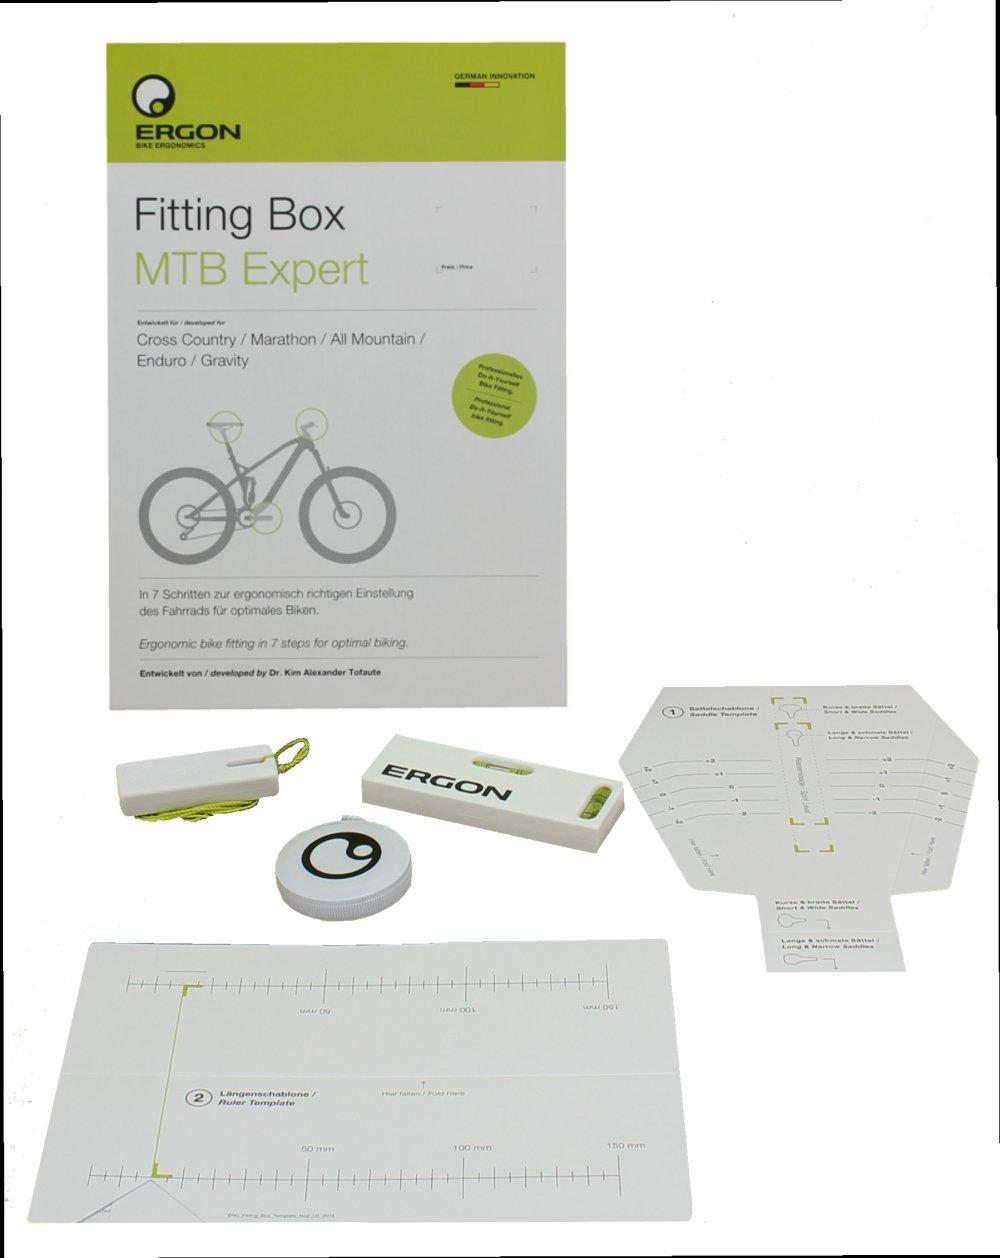 Ergon Fitting Box Bicycle MTB Expert Einstellhilfe 48100012 by Ergon